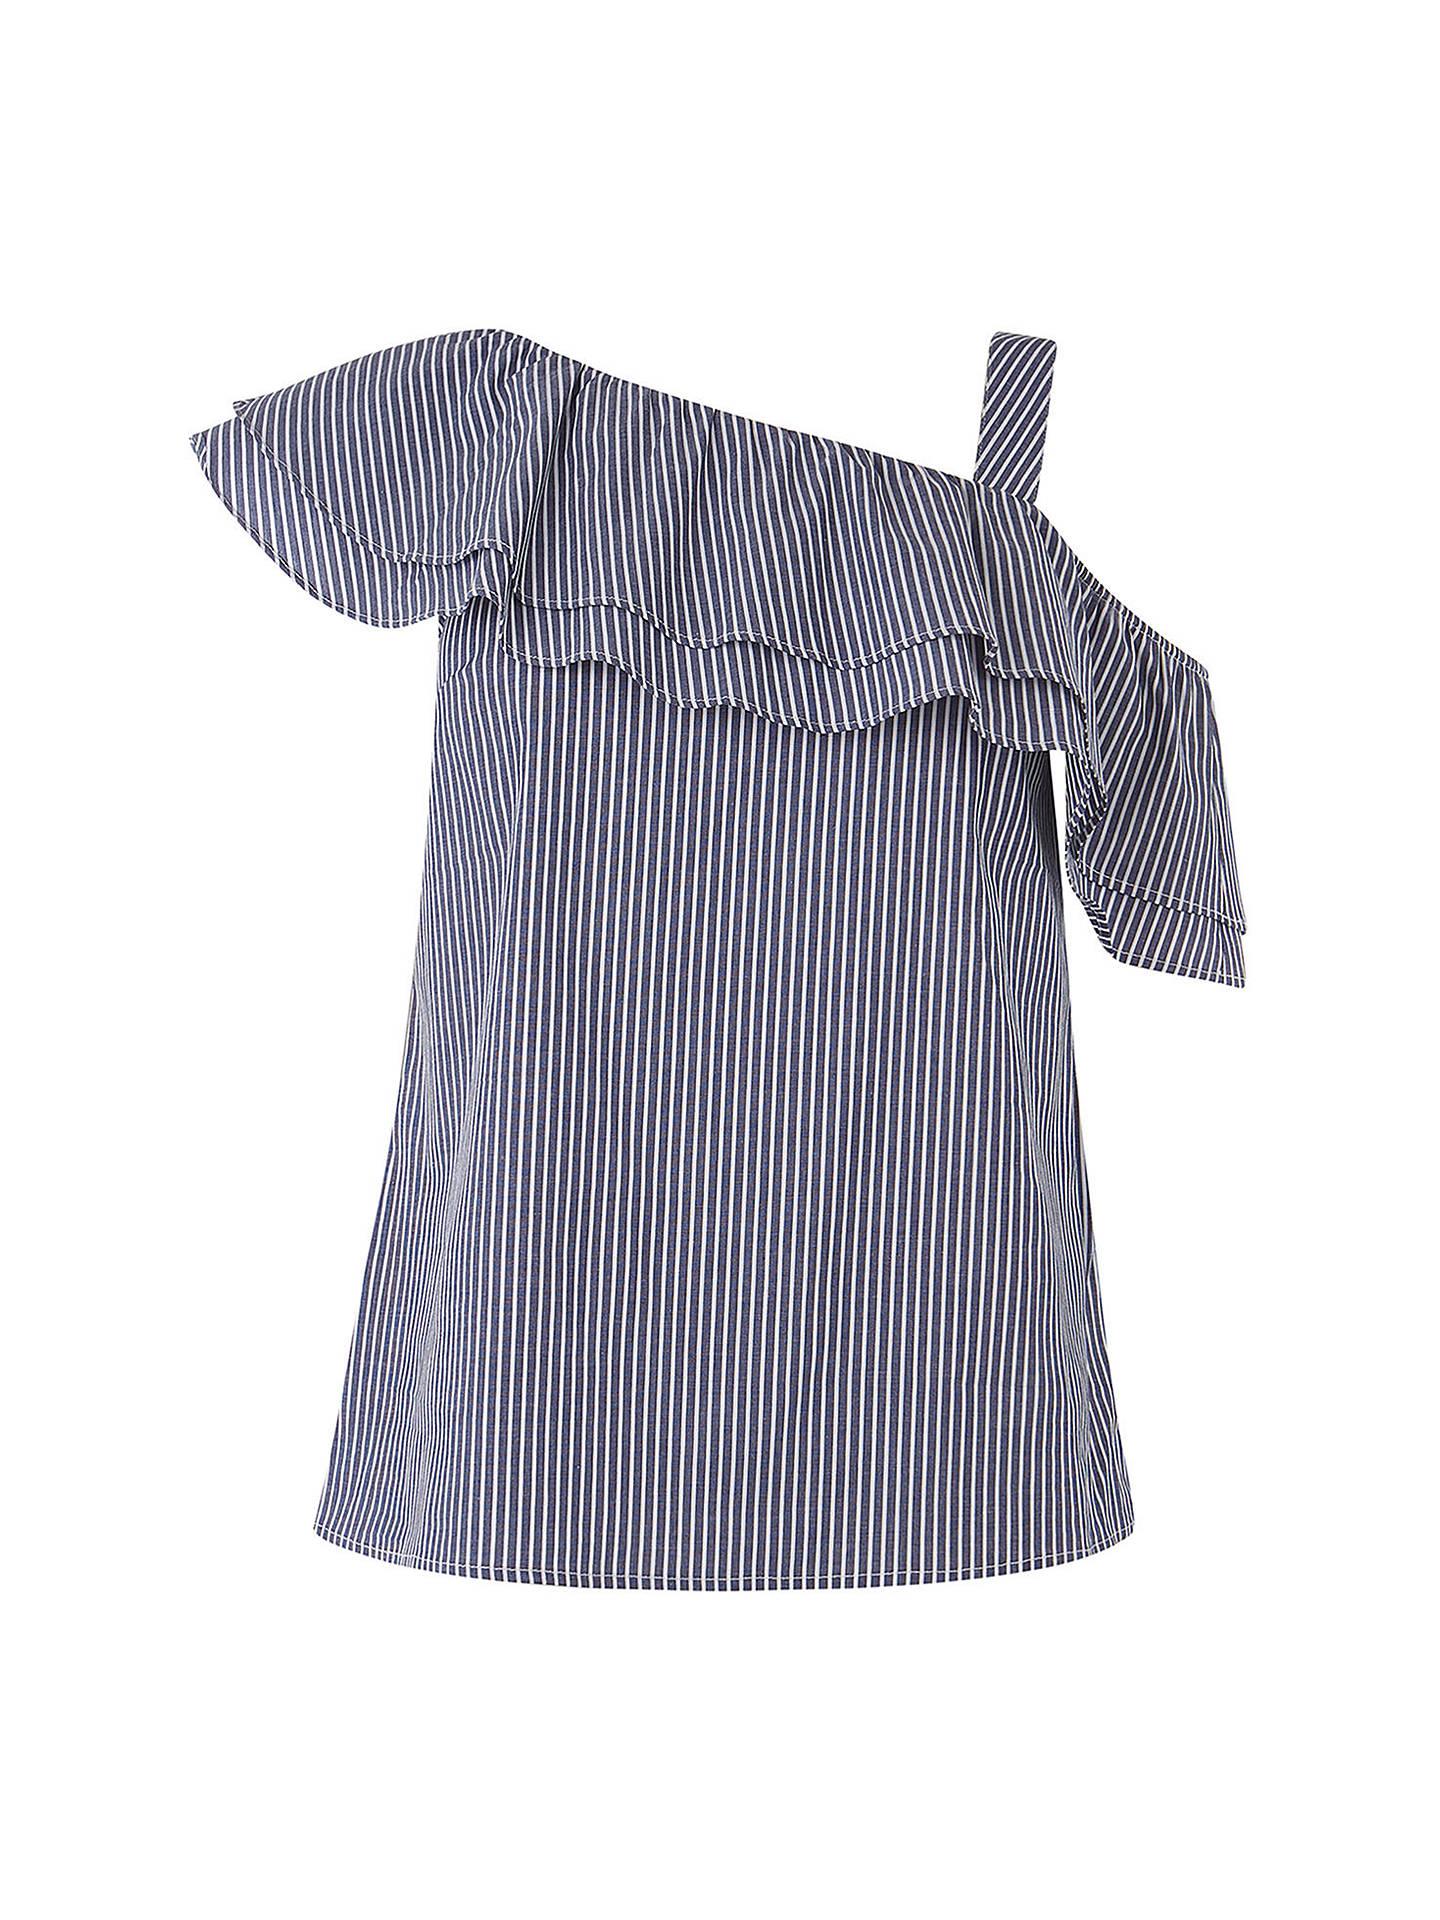 65ac7c2f997b66 ... Buy Oasis One Shoulder Striped Top